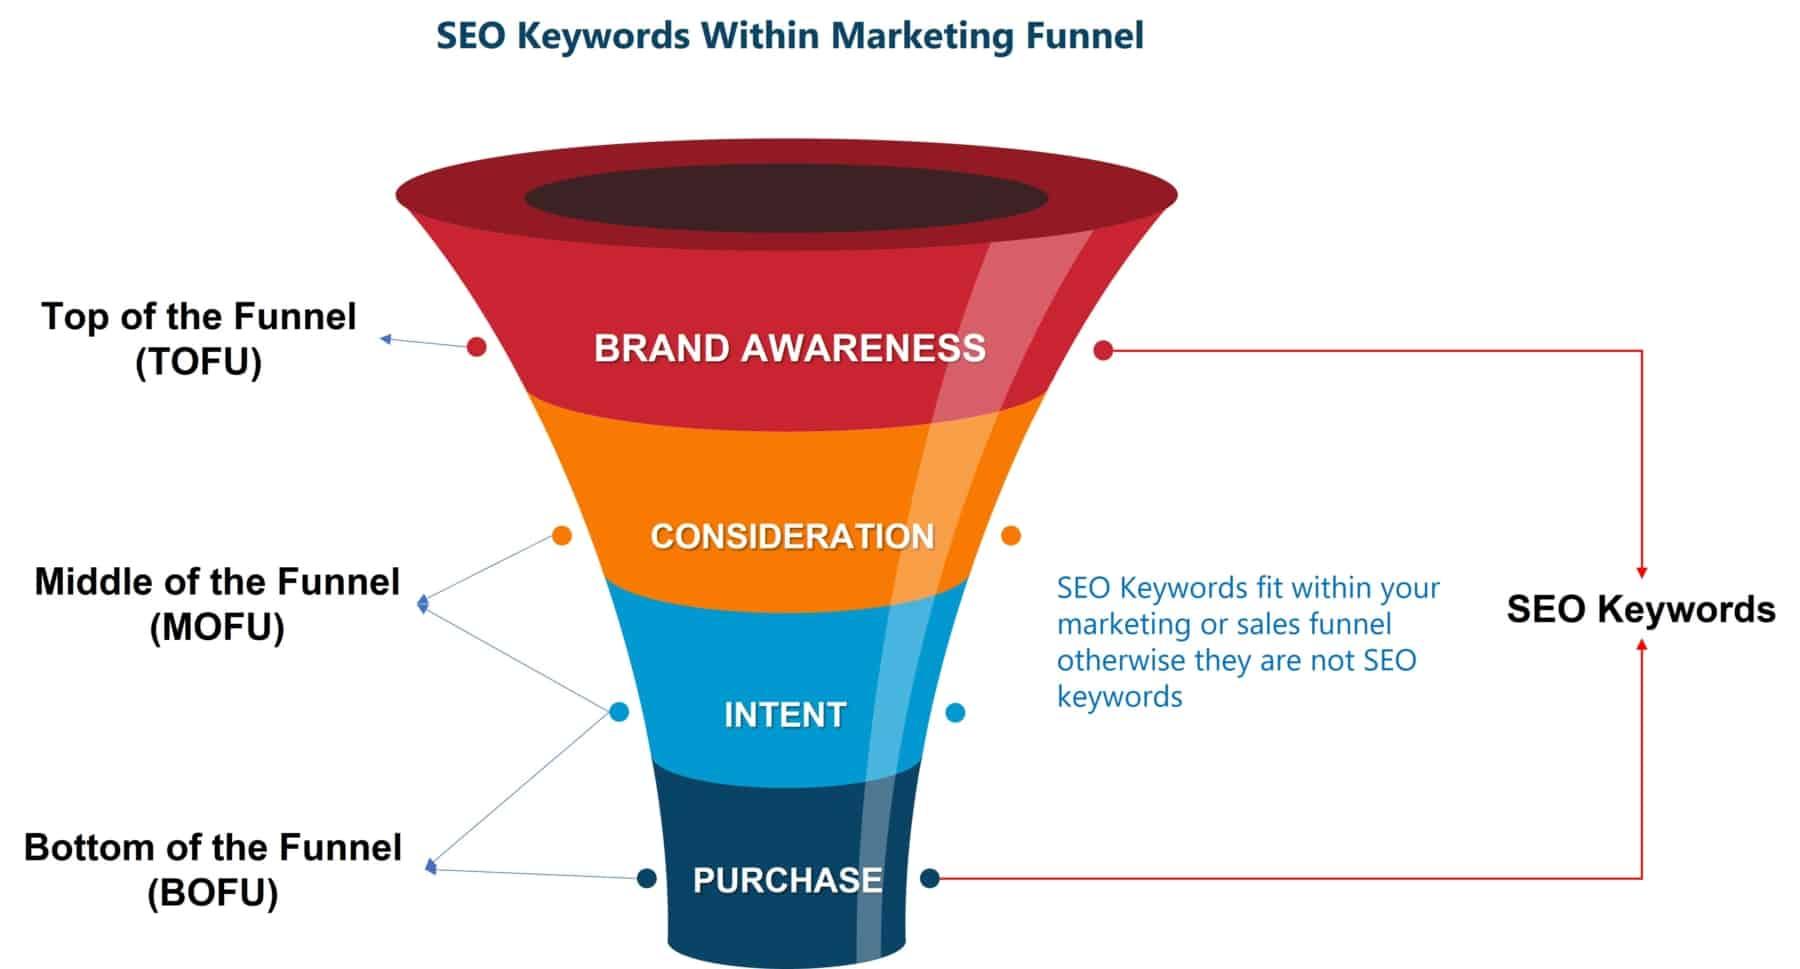 seo keywords within marketing funnel